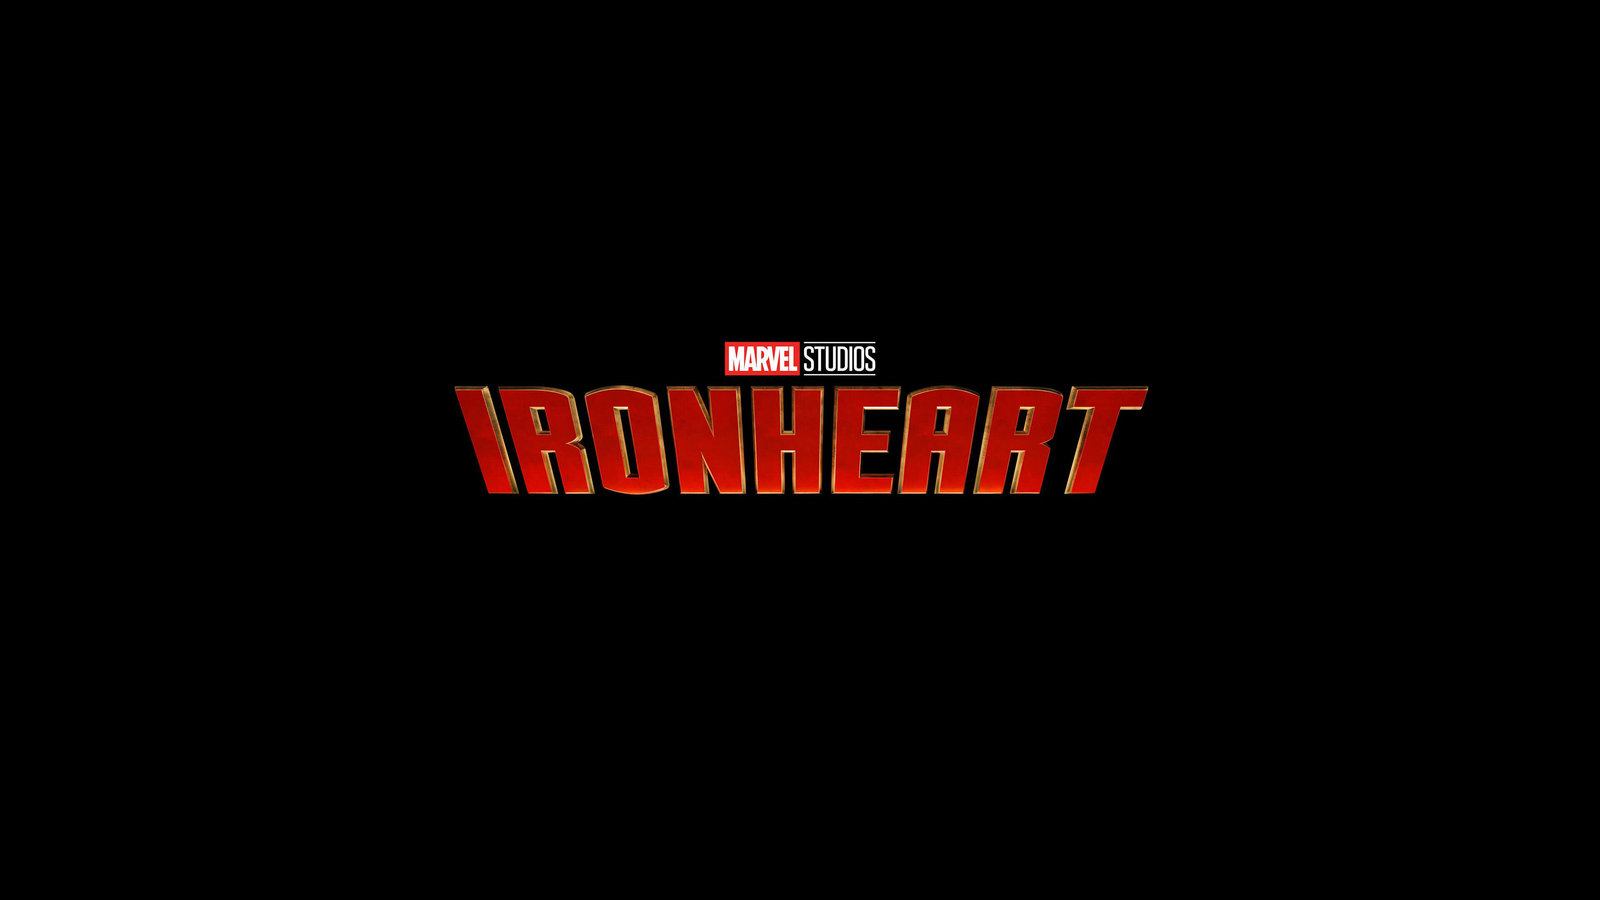 iron-heart-nf.jpg